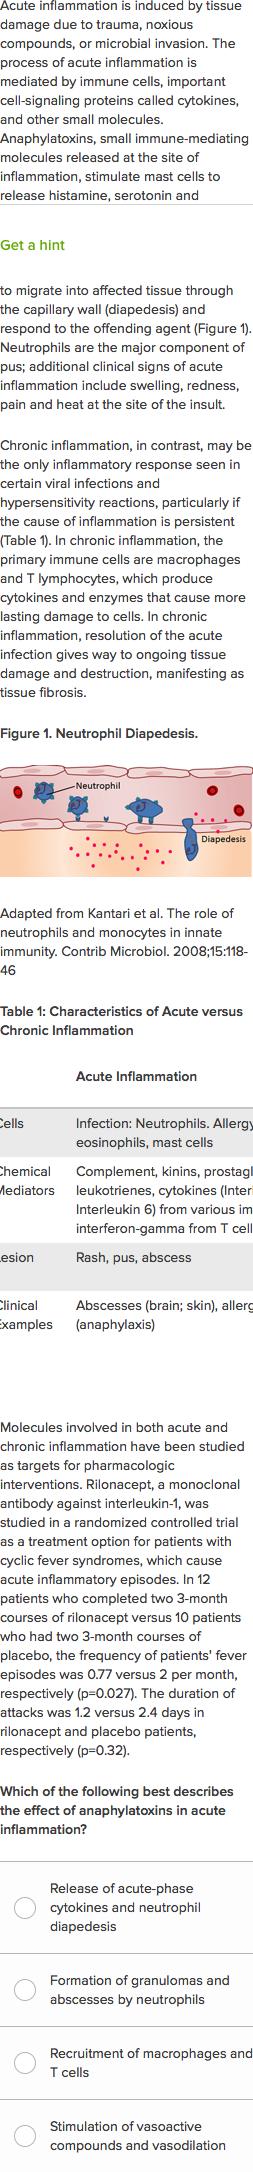 Immunology of acute vs  chronic inflammation (practice) | Khan Academy